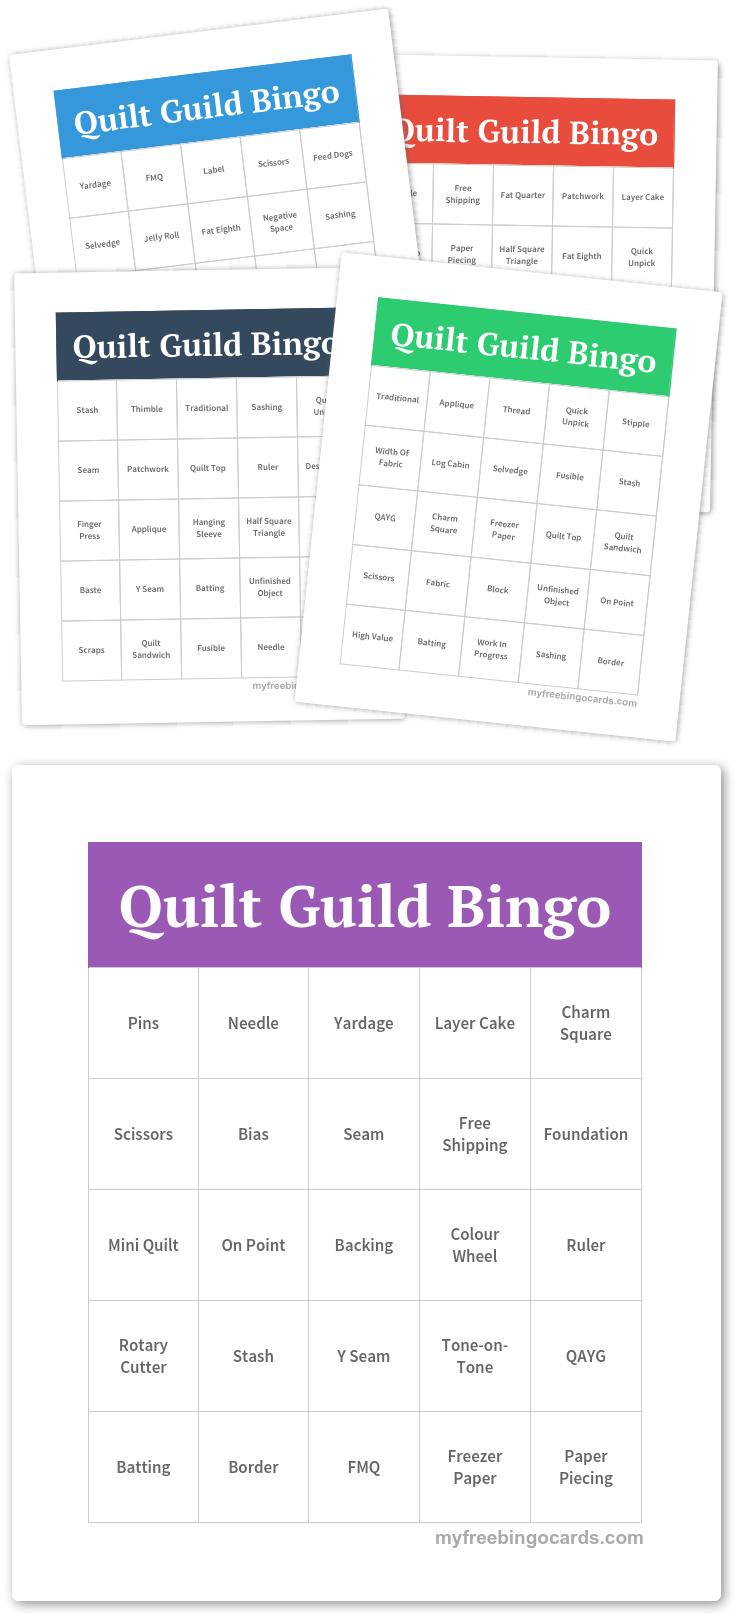 Free Printable Bingo Cards   Free Bingo Cards, Bingo Cards